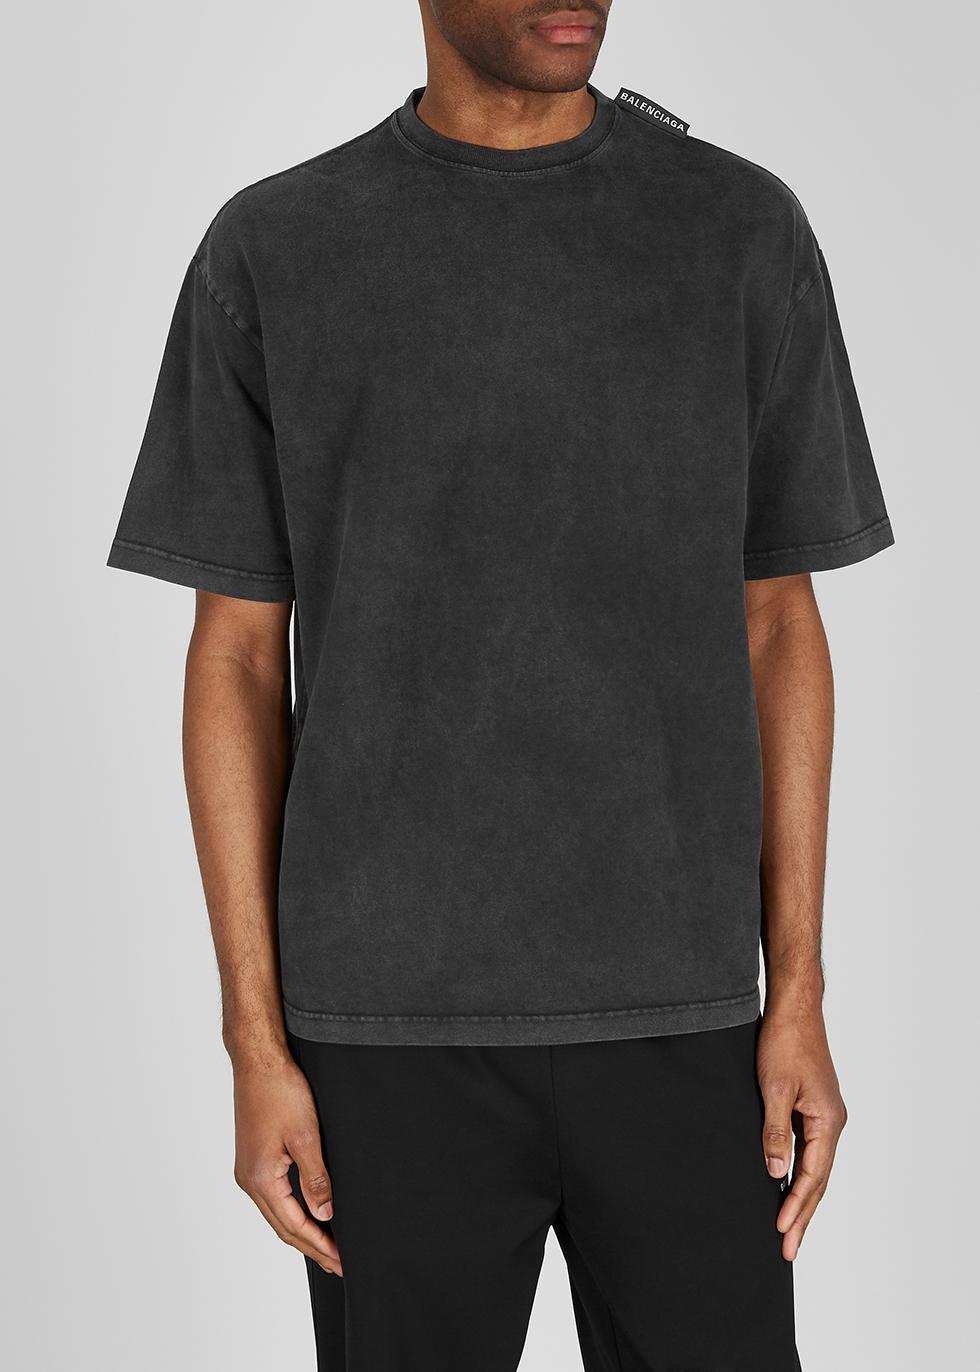 Balenciaga Dark grey cotton T-shirt